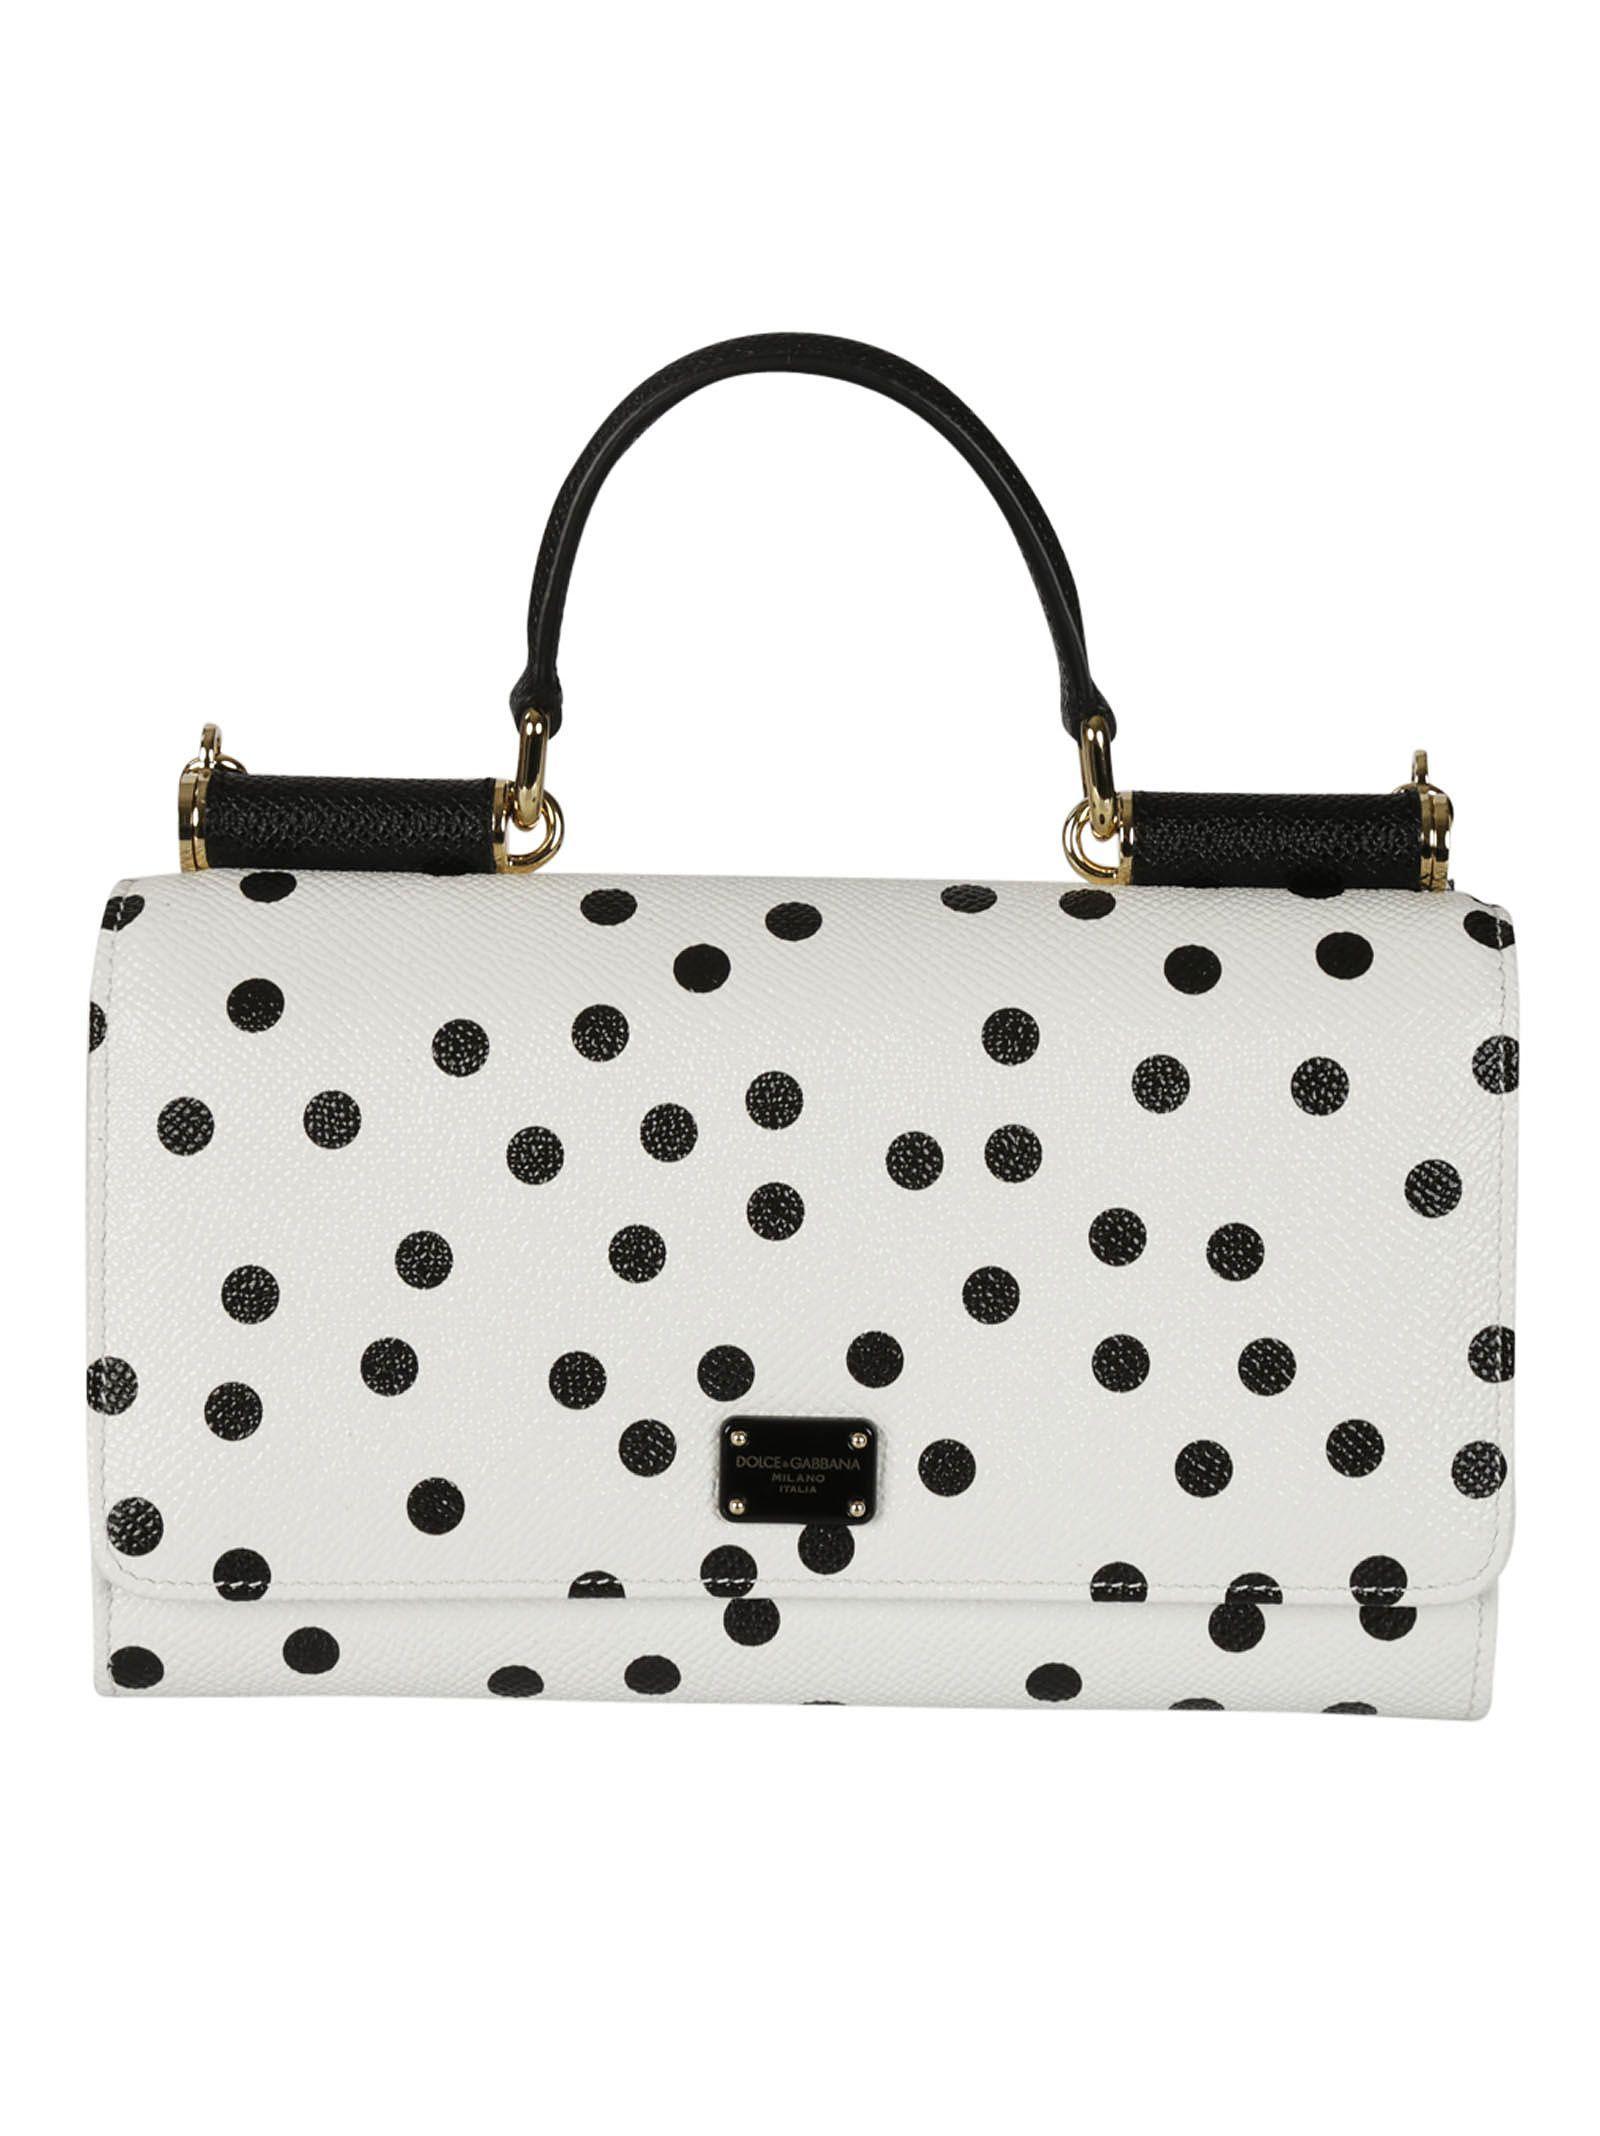 356f49c5e3be DOLCE & GABBANA . #dolcegabbana #bags #shoulder bags #hand bags ...